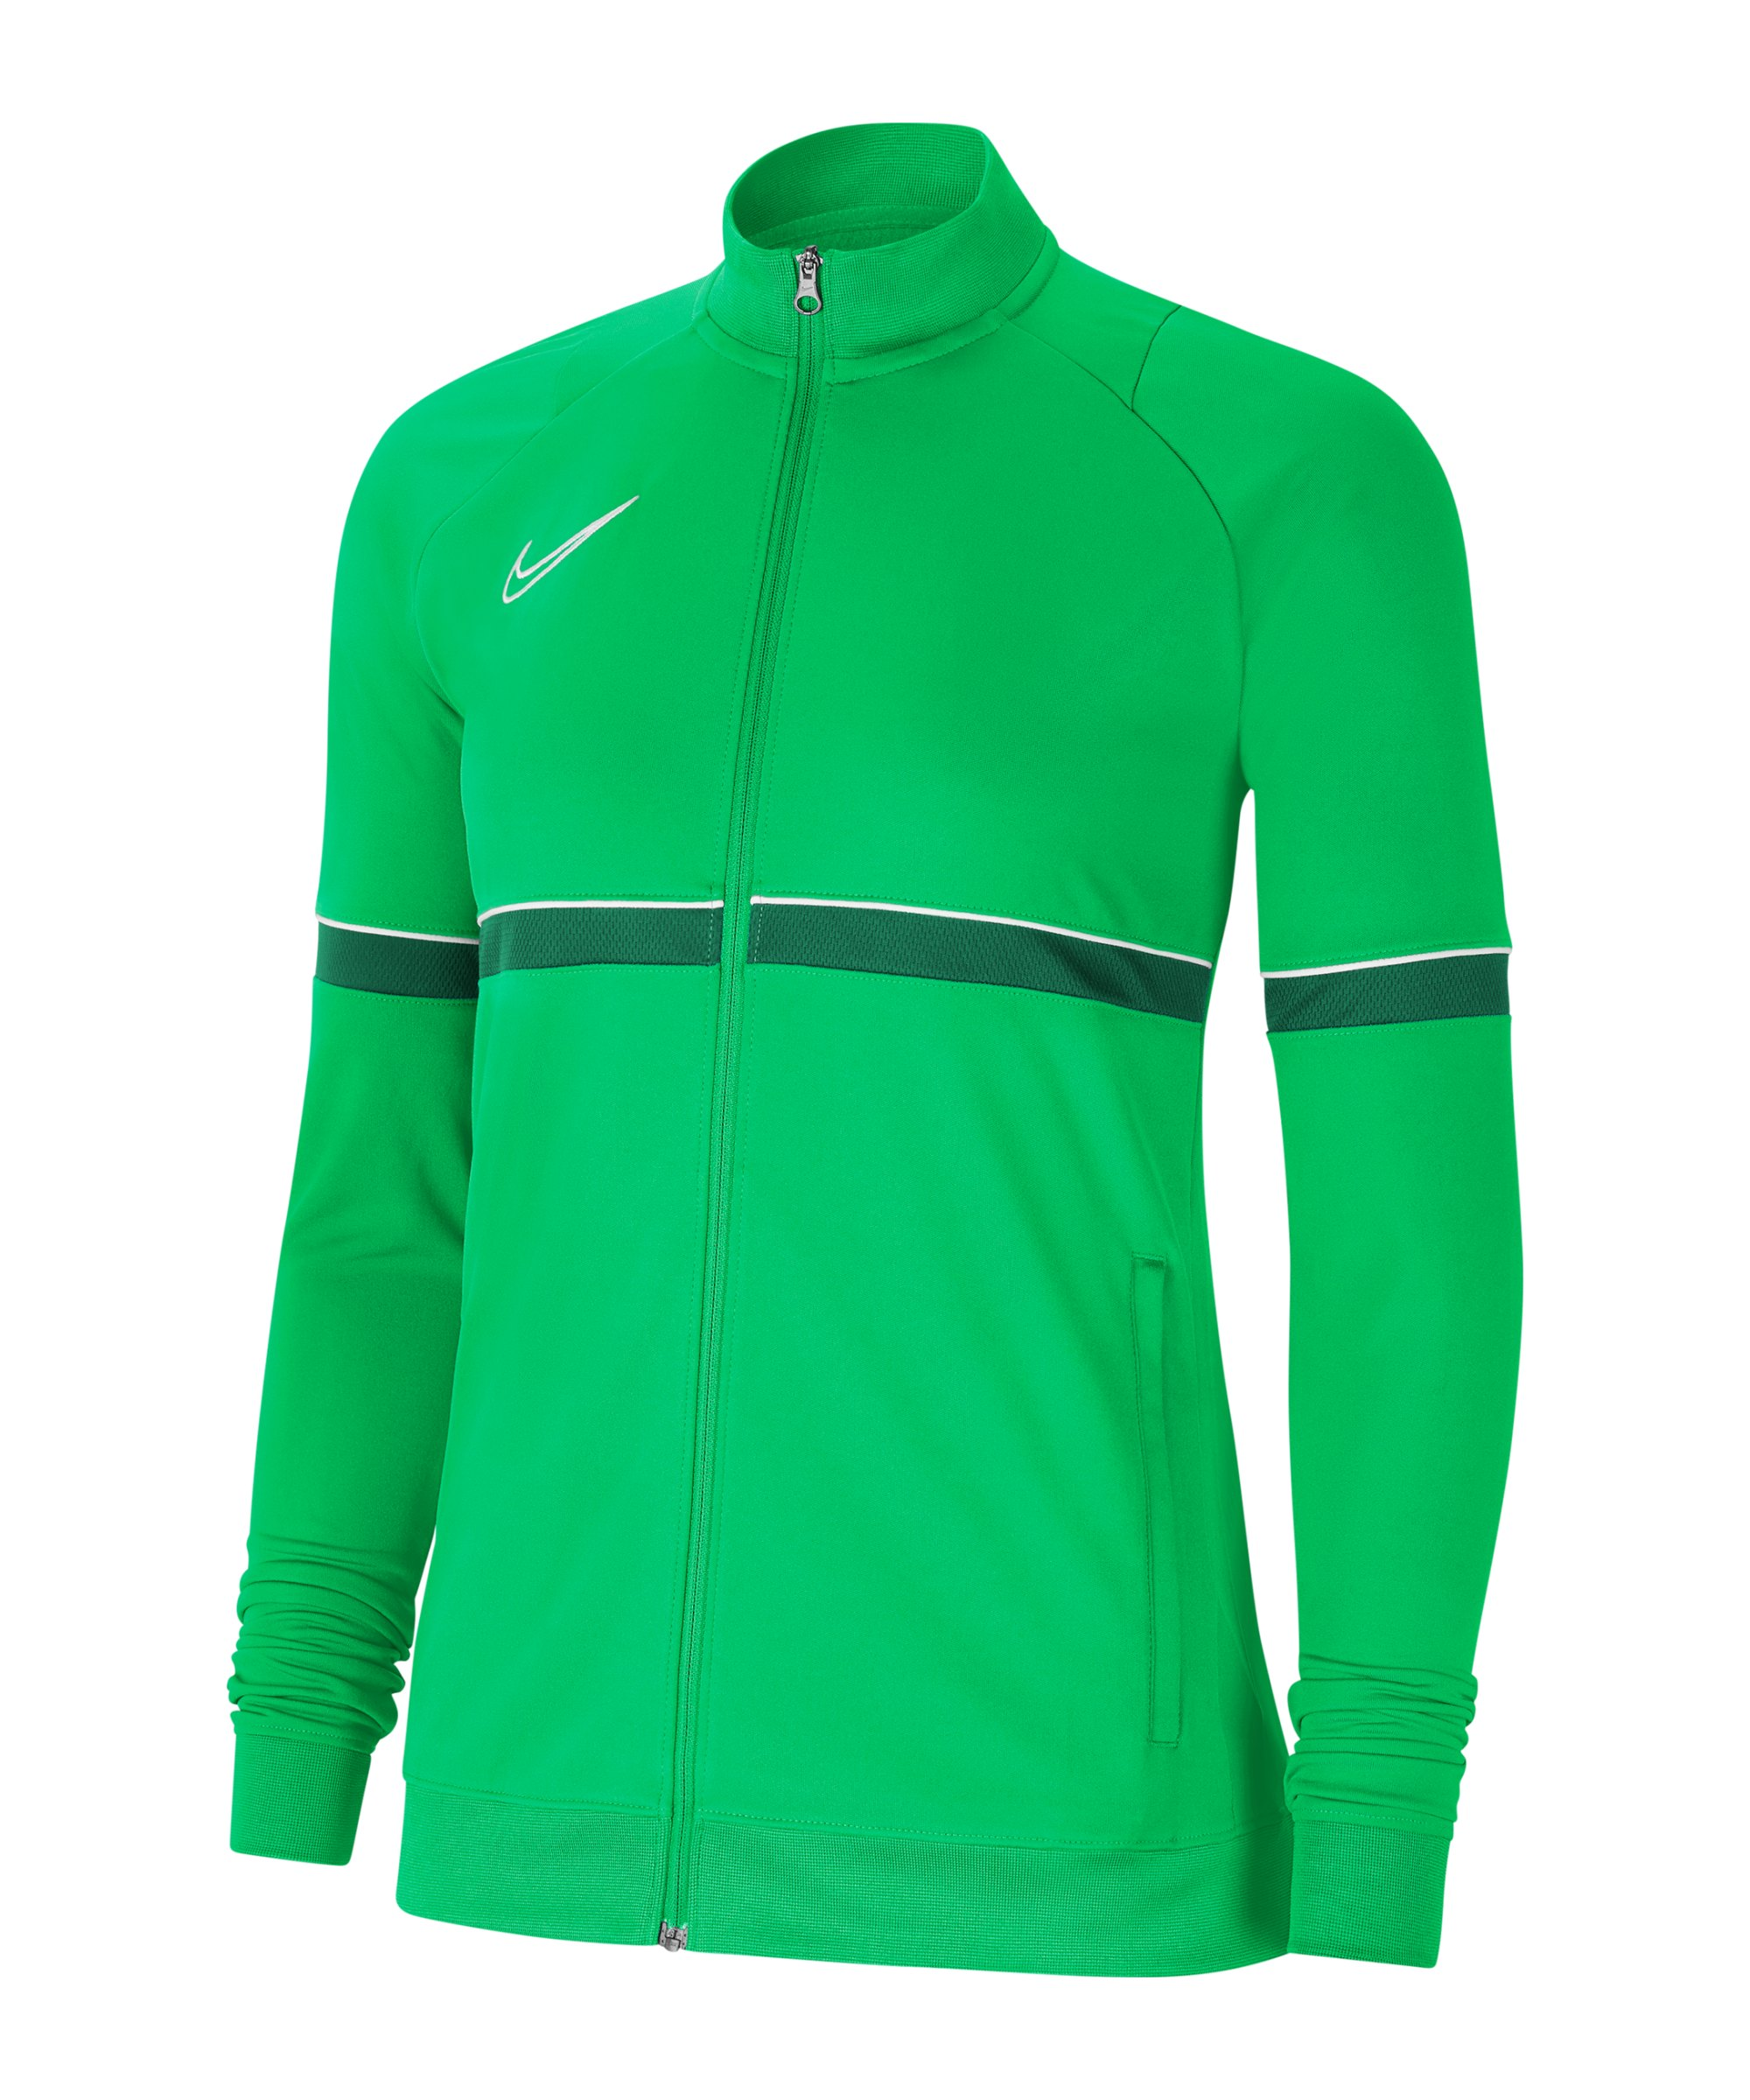 Nike Academy 21 Tainingsjacke Damen Grün F362 - gruen